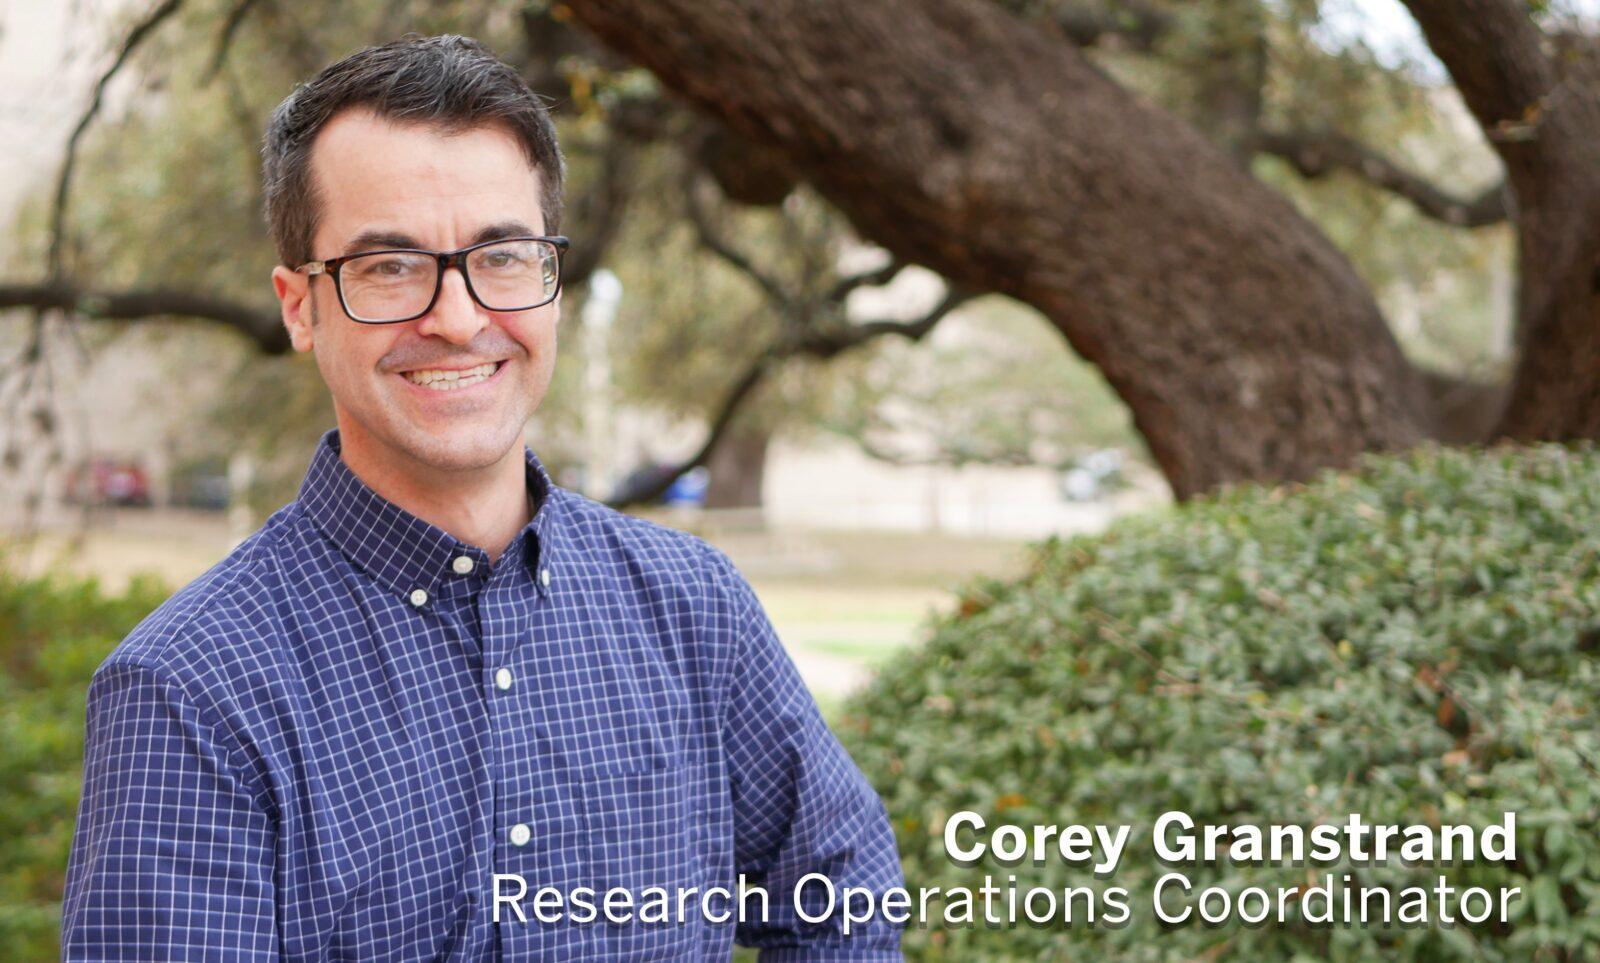 Corey Granstrand, Research Operations Coordinator